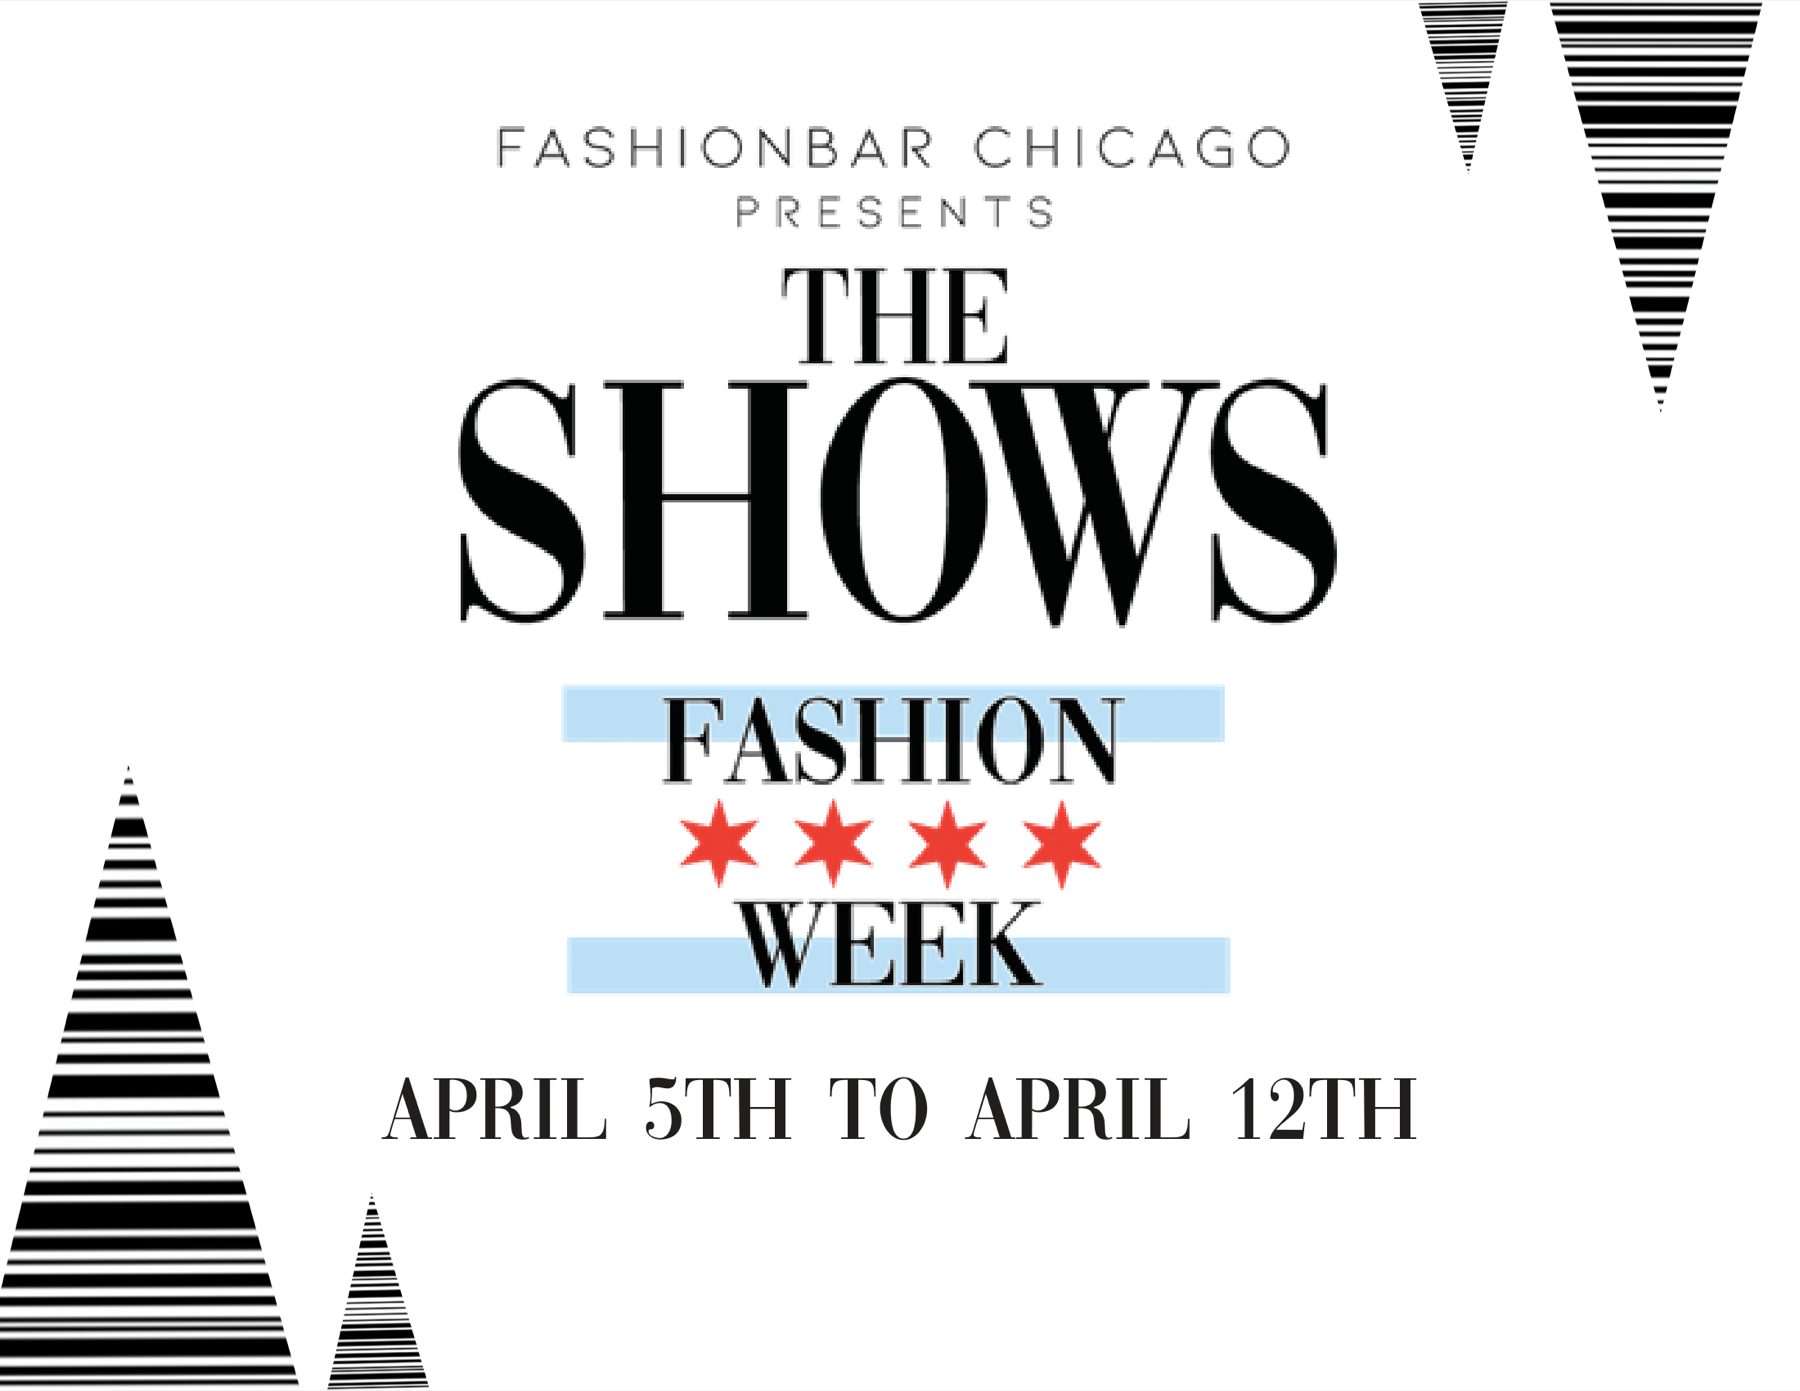 THE SHOWS APRIL 2020 – Chicago Fashion Week pwrd by FashionBar Chicago